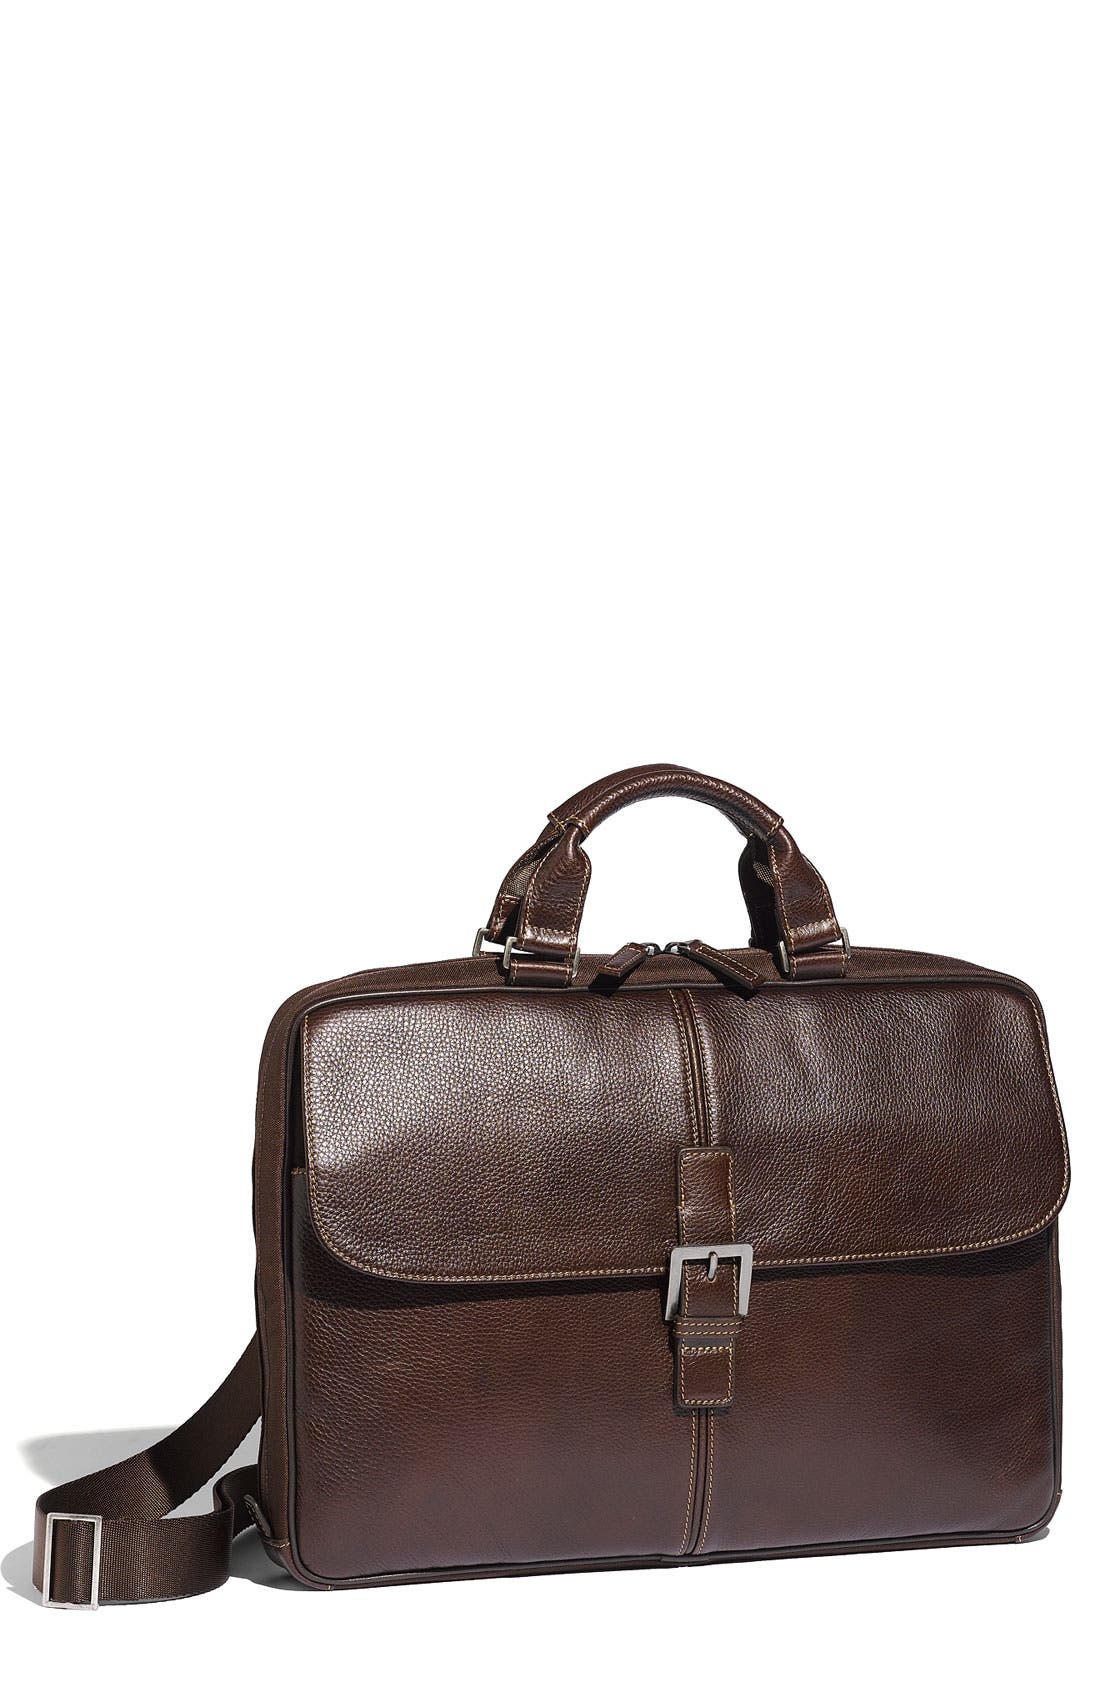 BOCONI, 'Tyler' Tumbled Leather Portfolio Briefcase, Main thumbnail 1, color, 205